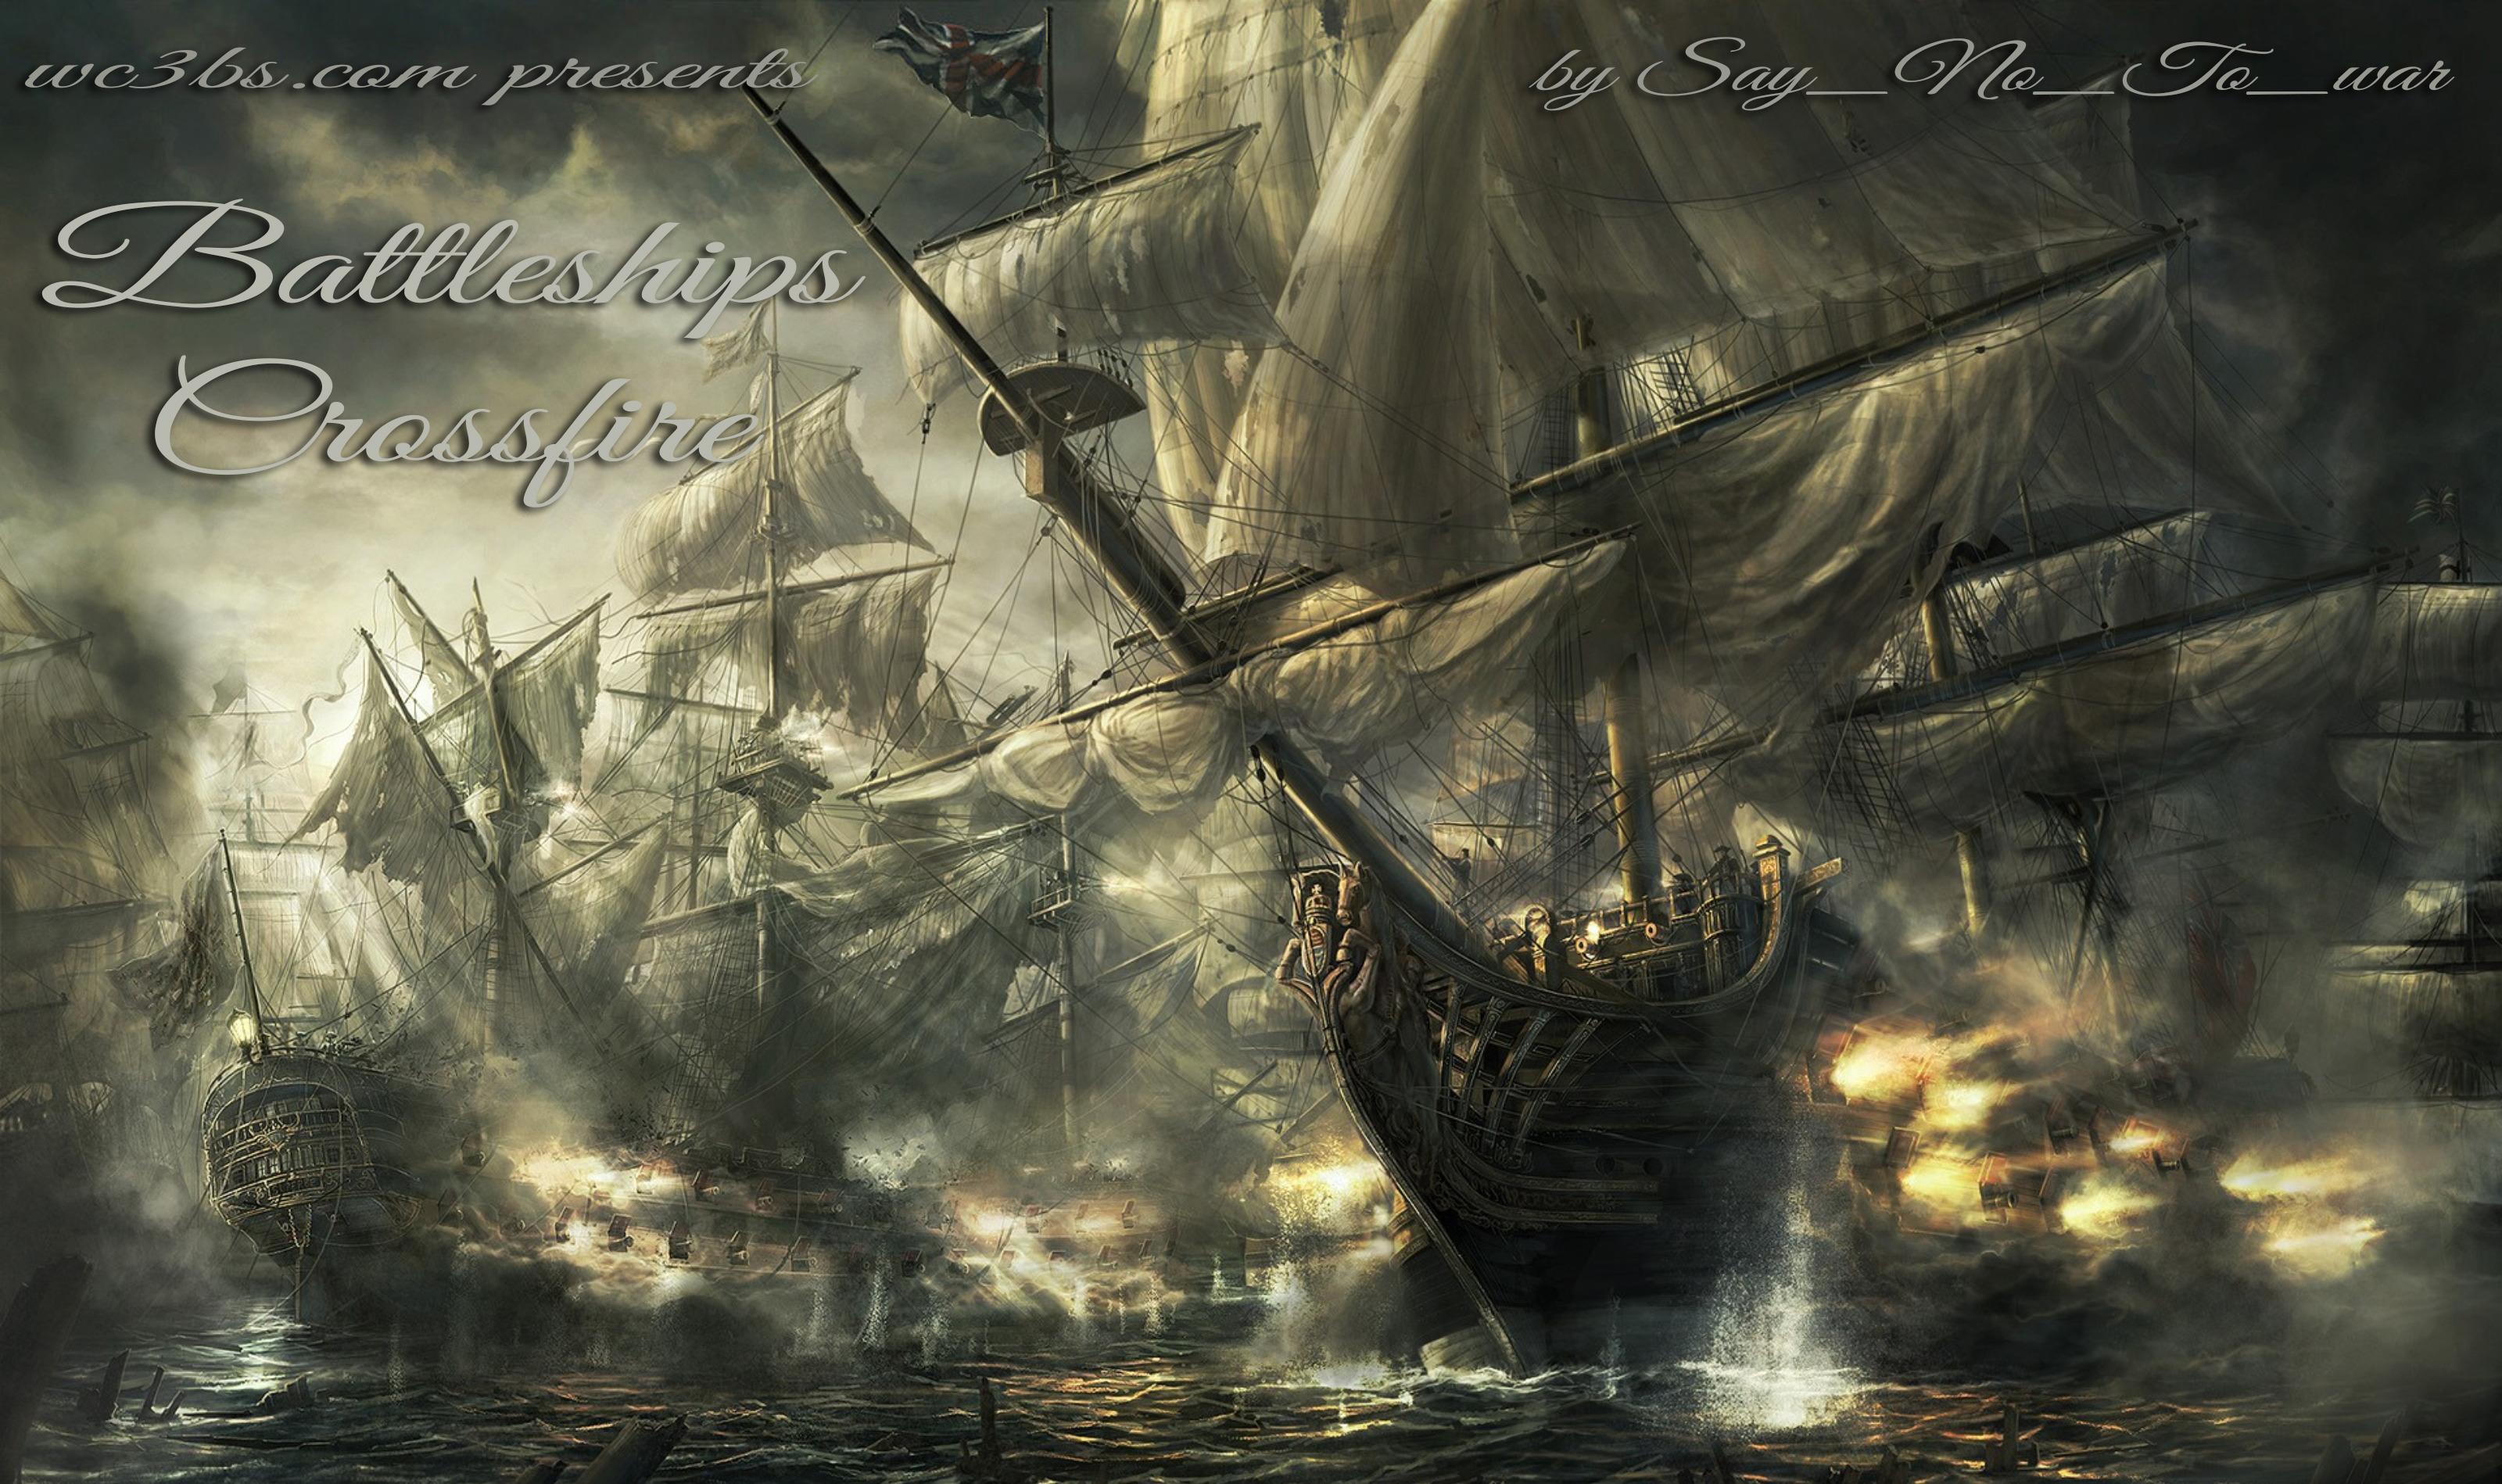 Battleships Crossfire 4.83 - Warcraft 3: Custom Map avatar